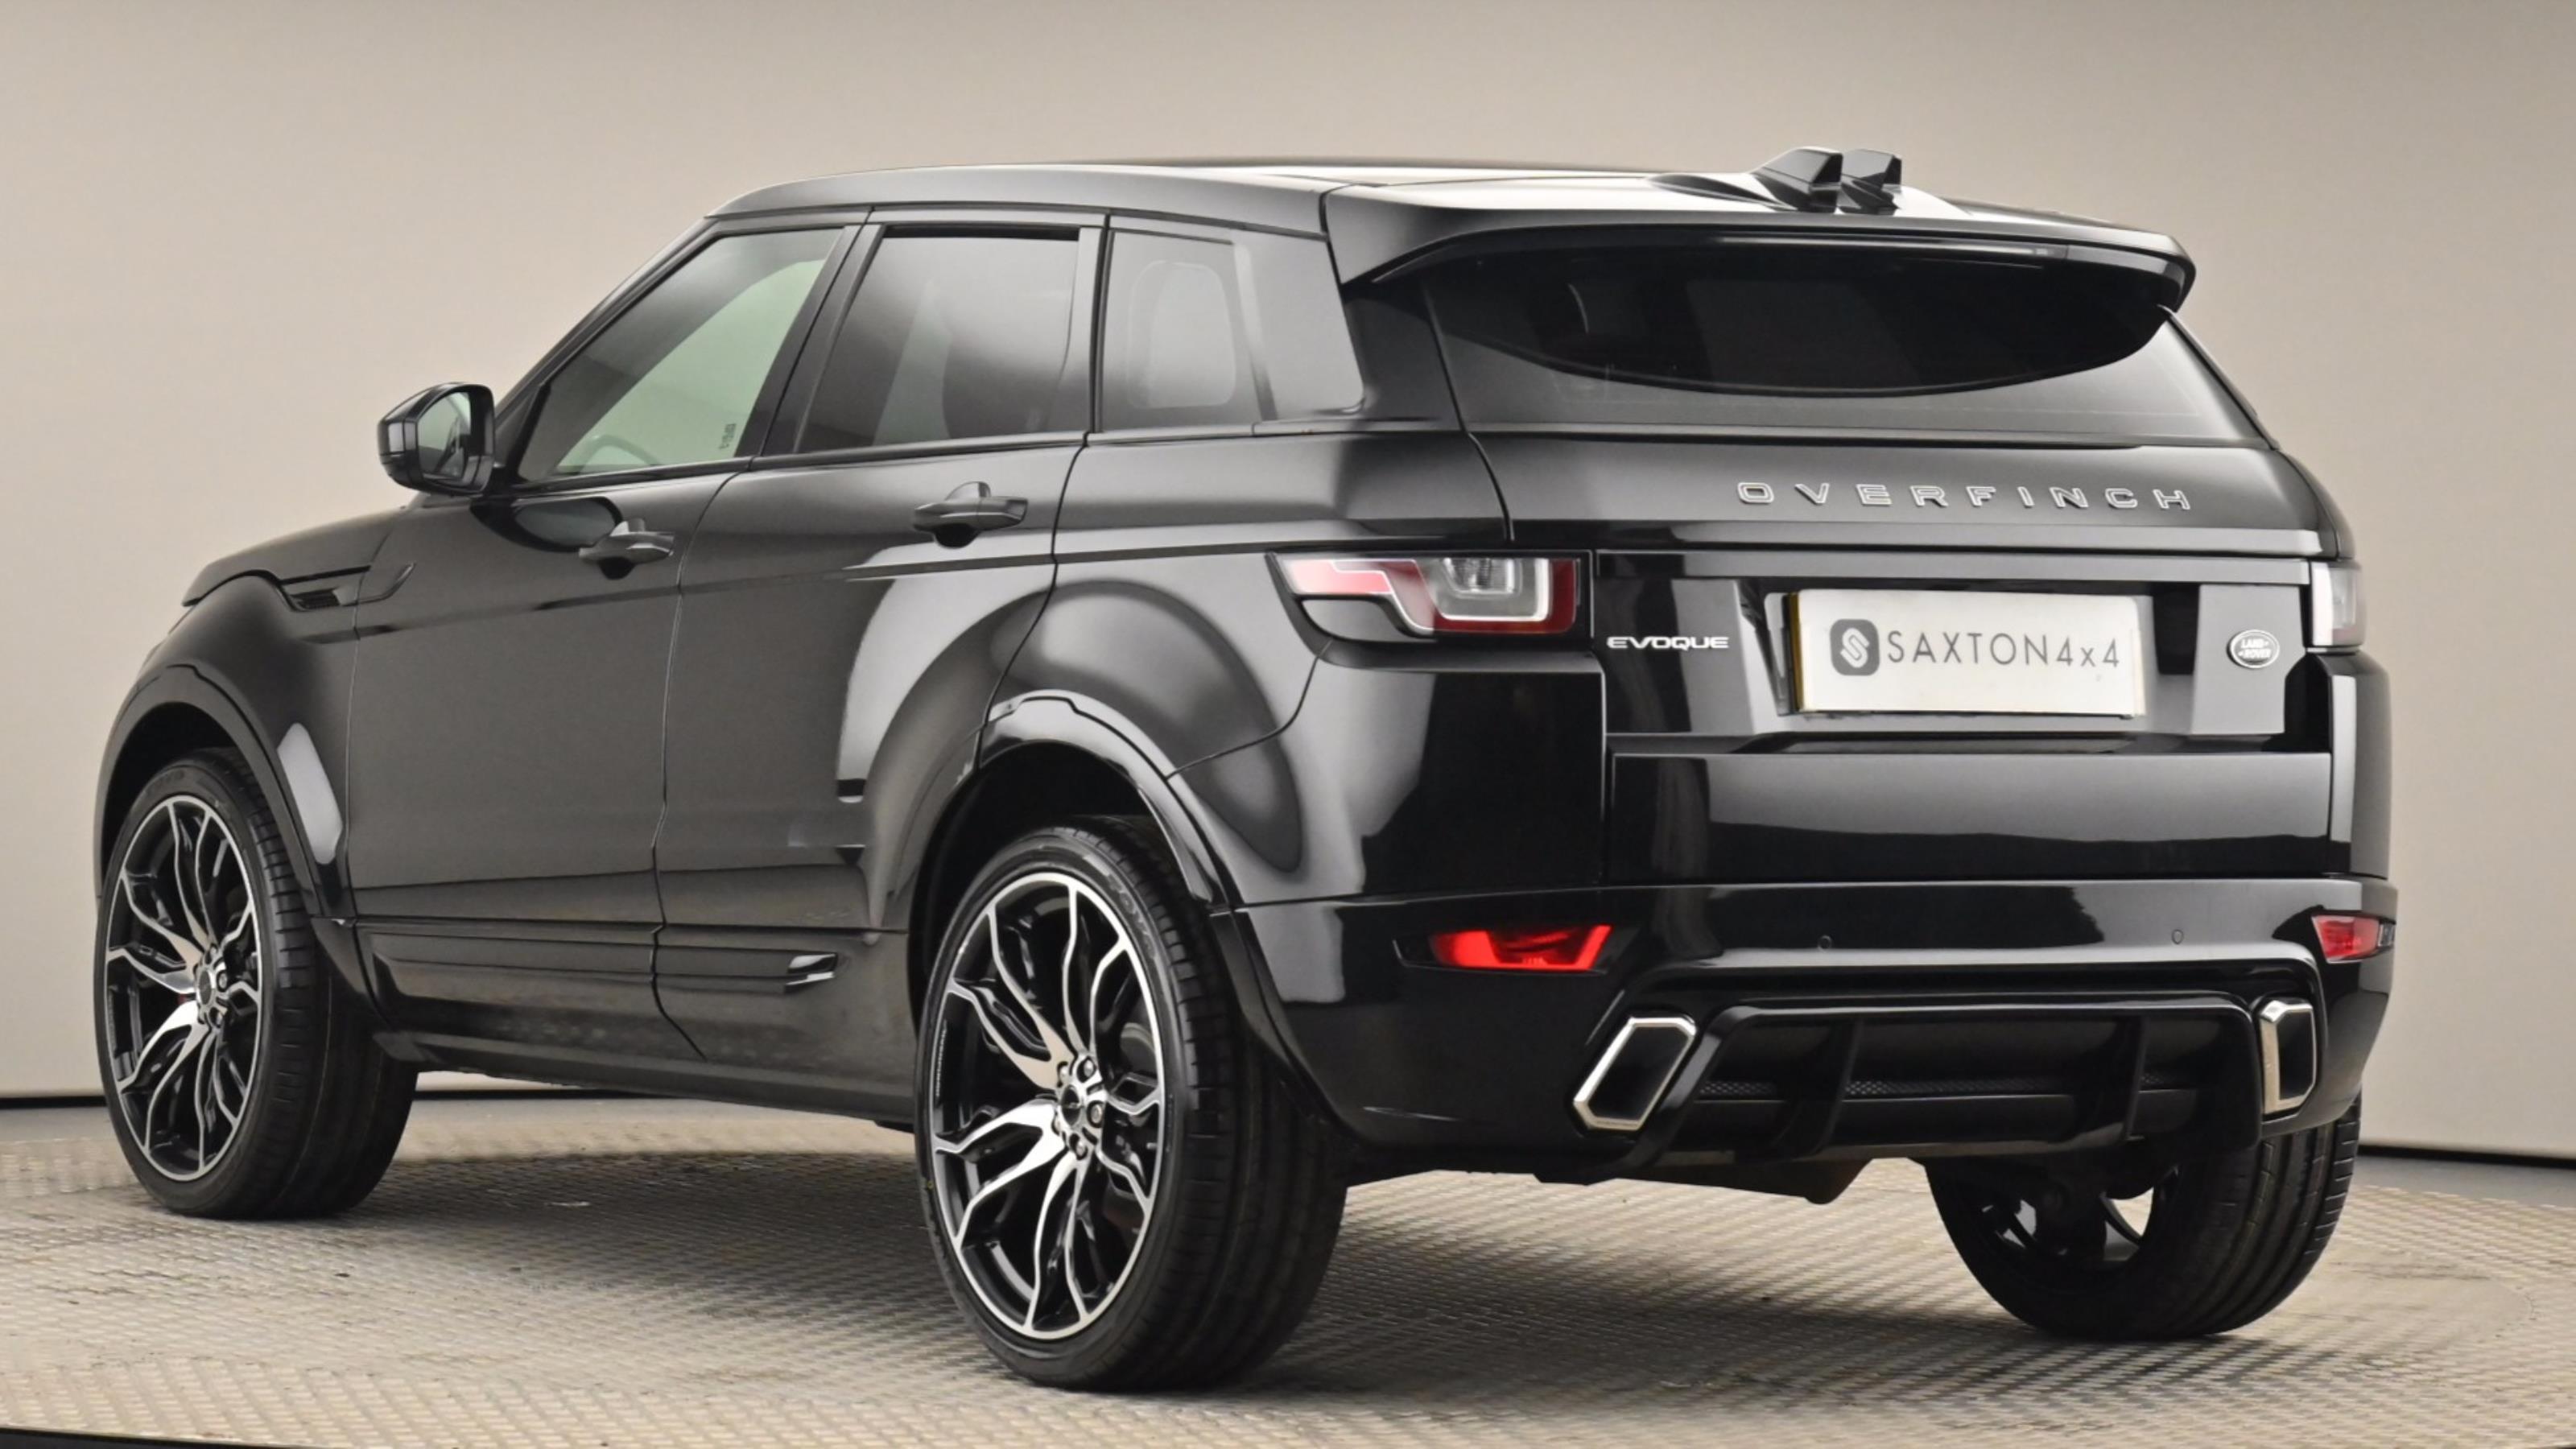 Used 2016 Land Rover RANGE ROVER EVOQUE 2.0 TD4 SE Tech 5dr Auto Black at Saxton4x4